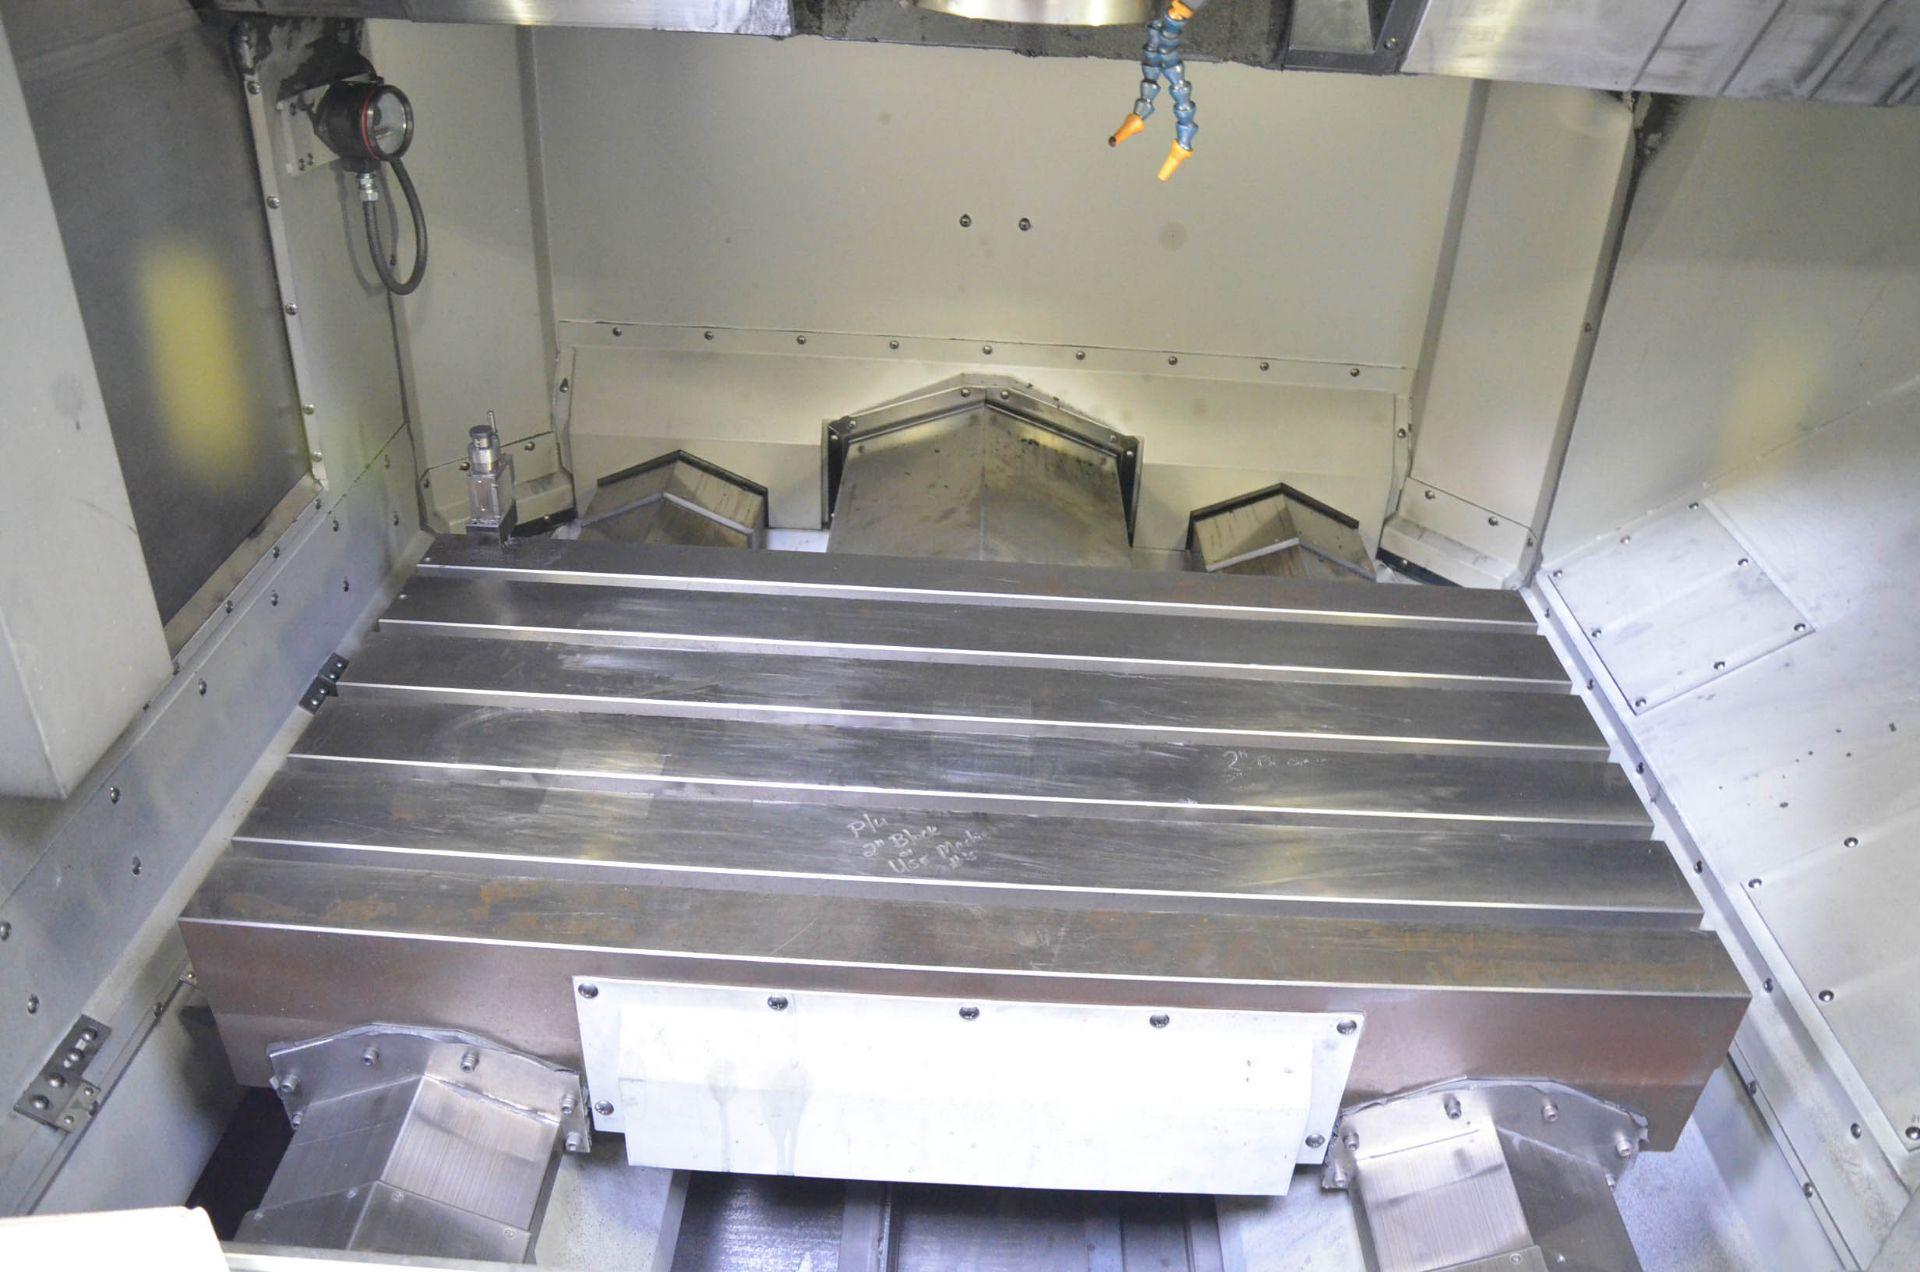 MAKINO (2008) V56 GRAPHITE CNC VERTICAL MACHINING CENTER WITH MAKINO PROFESSIONAL 5 TOUCHSCREEN - Image 6 of 10